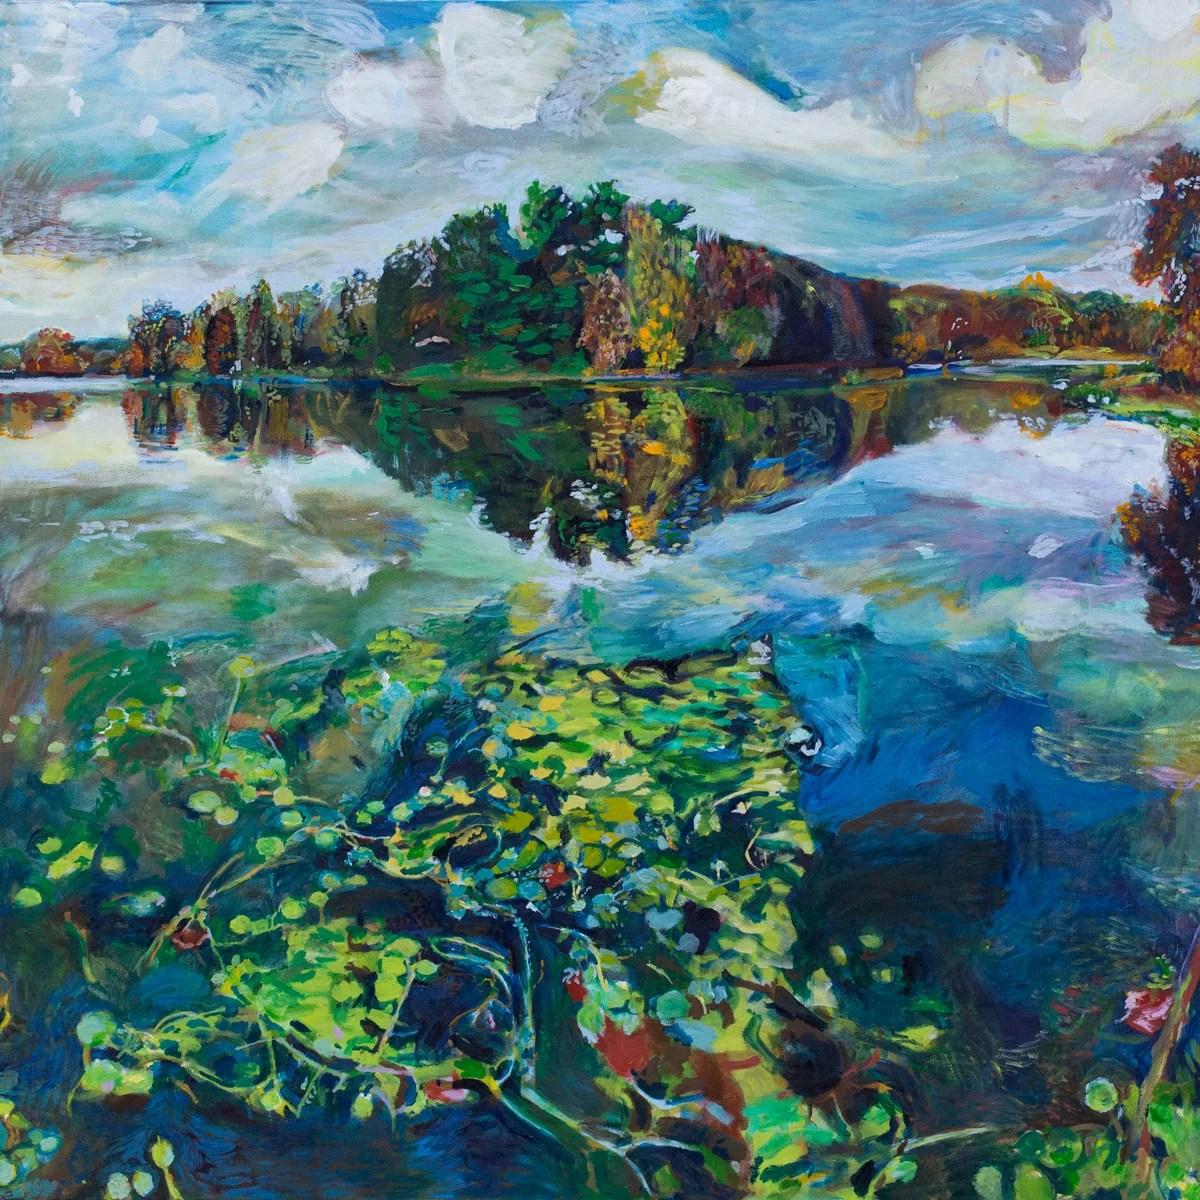 Painting of prospect park by Noel Hefele